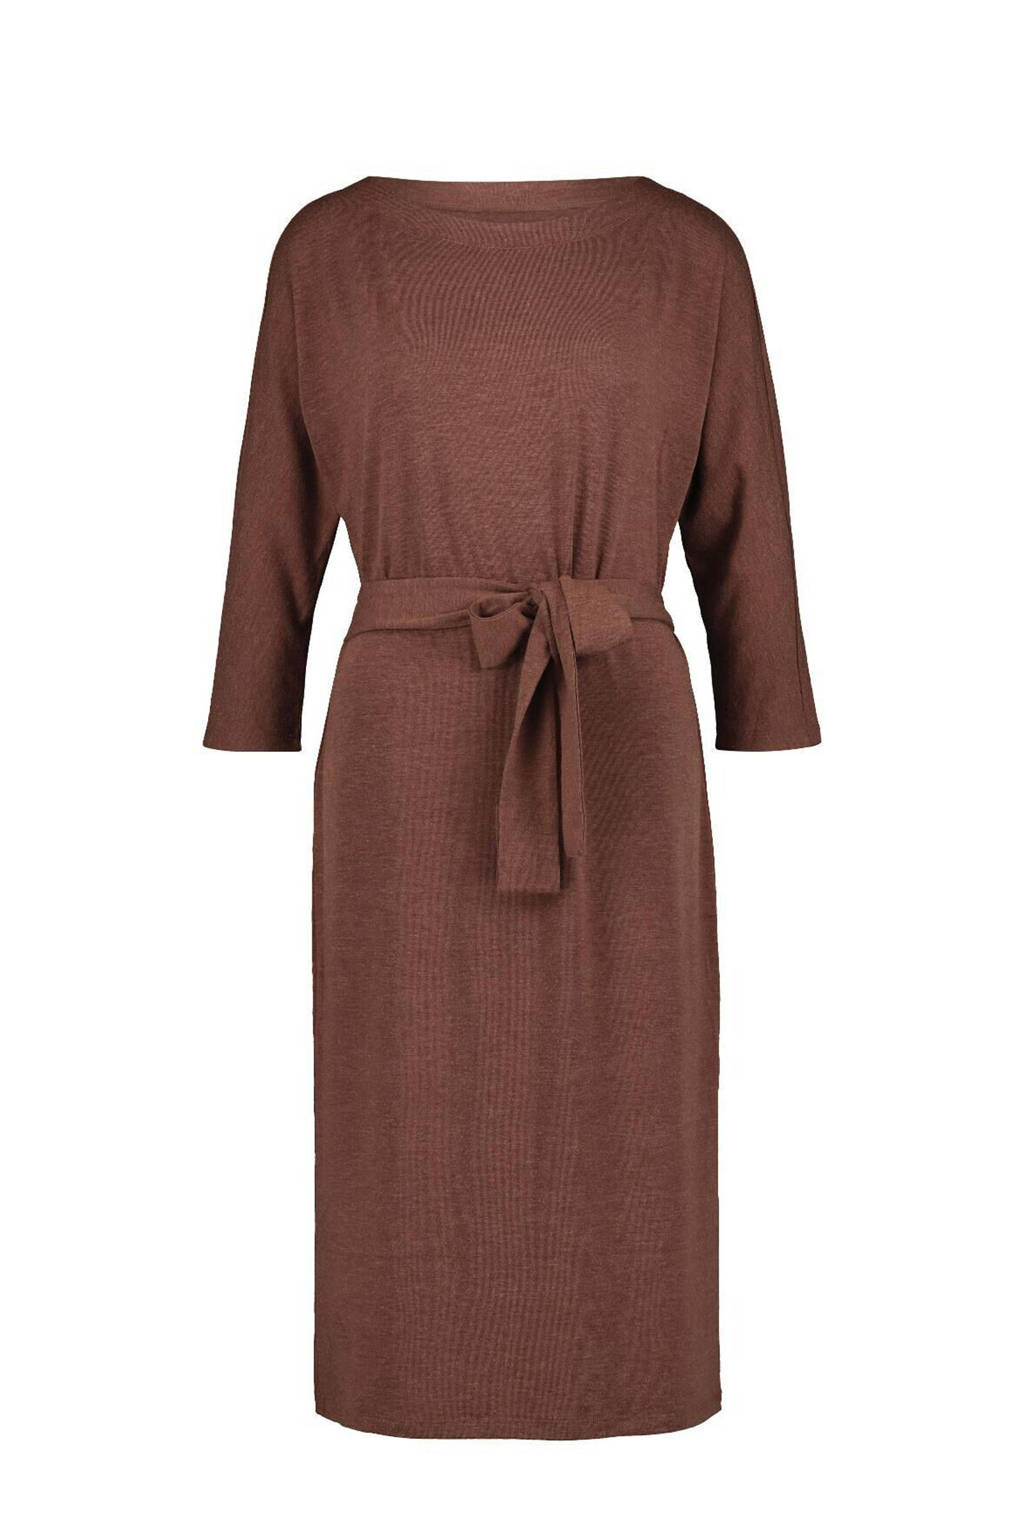 HEMA gemêleerde fijngebreide jurk bruin, Bruin